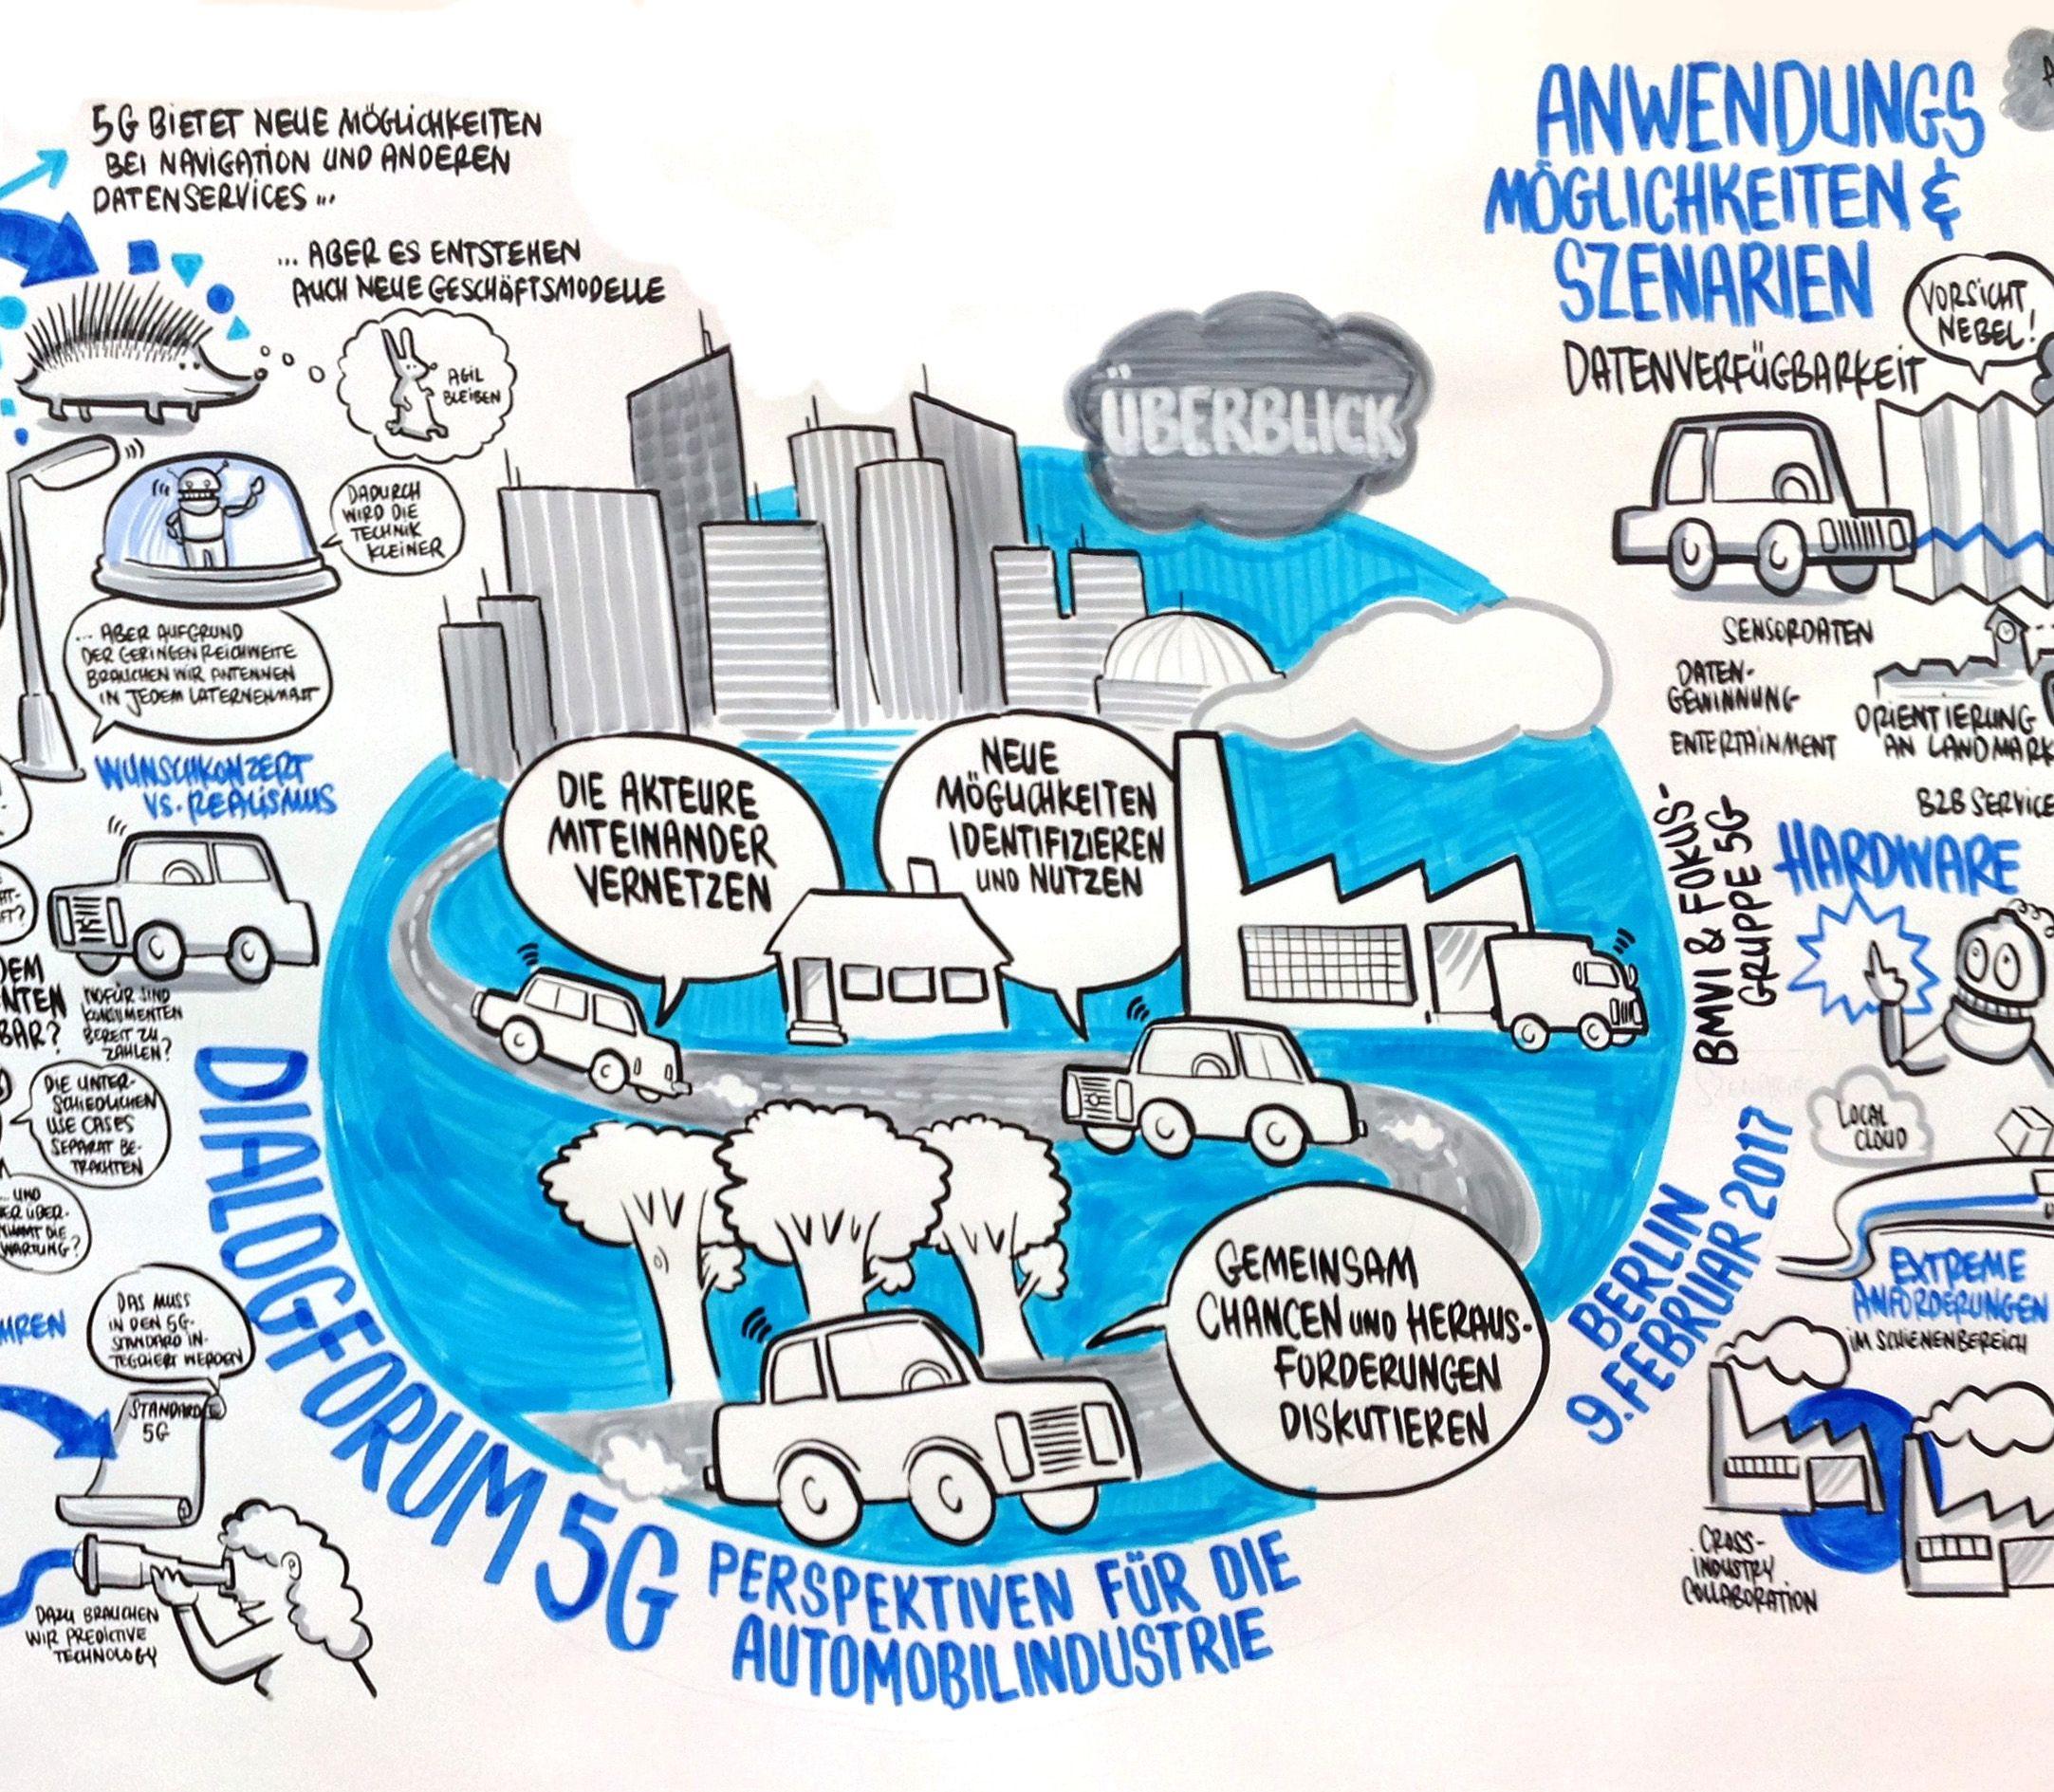 Graphic Recording: Dialogforum 5G - Perspektiven für die Automobilbranche http://www.playability.de